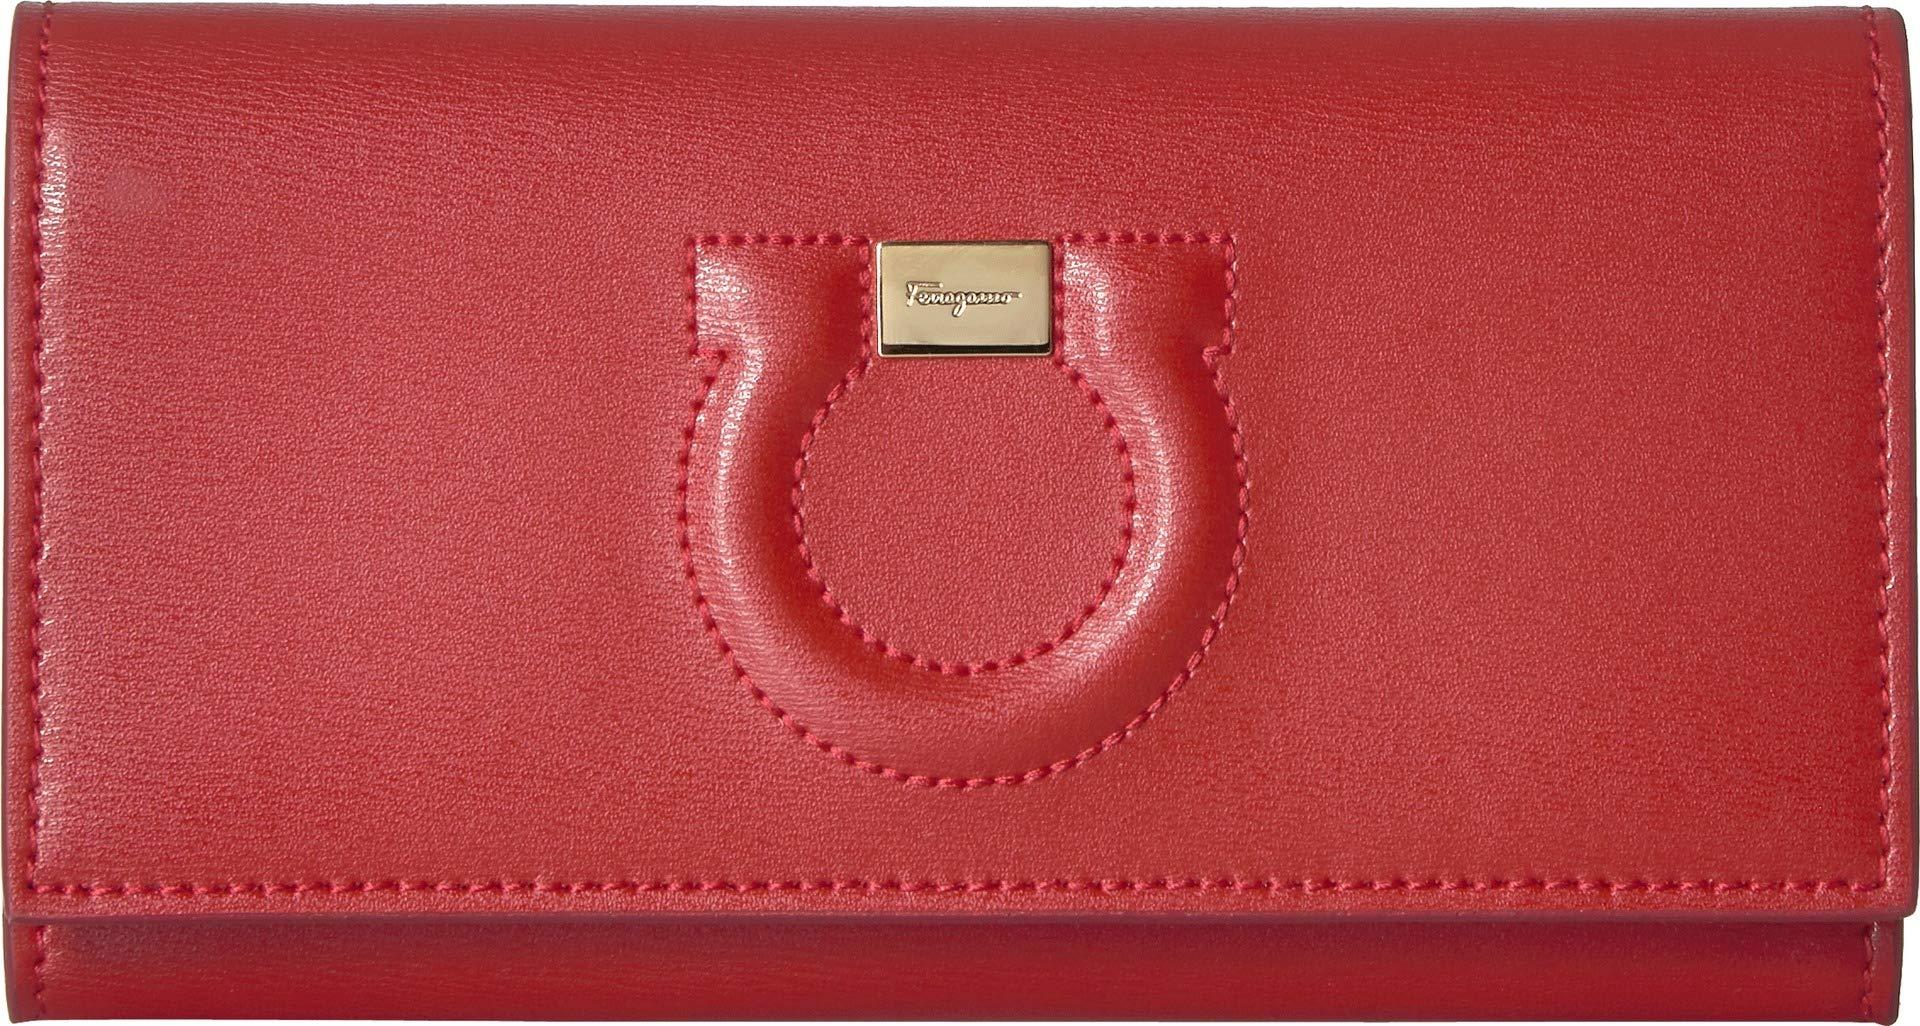 Salvatore Ferragamo Women's Gancio City Wallet on a Chain, Lipstick, Red, One Size